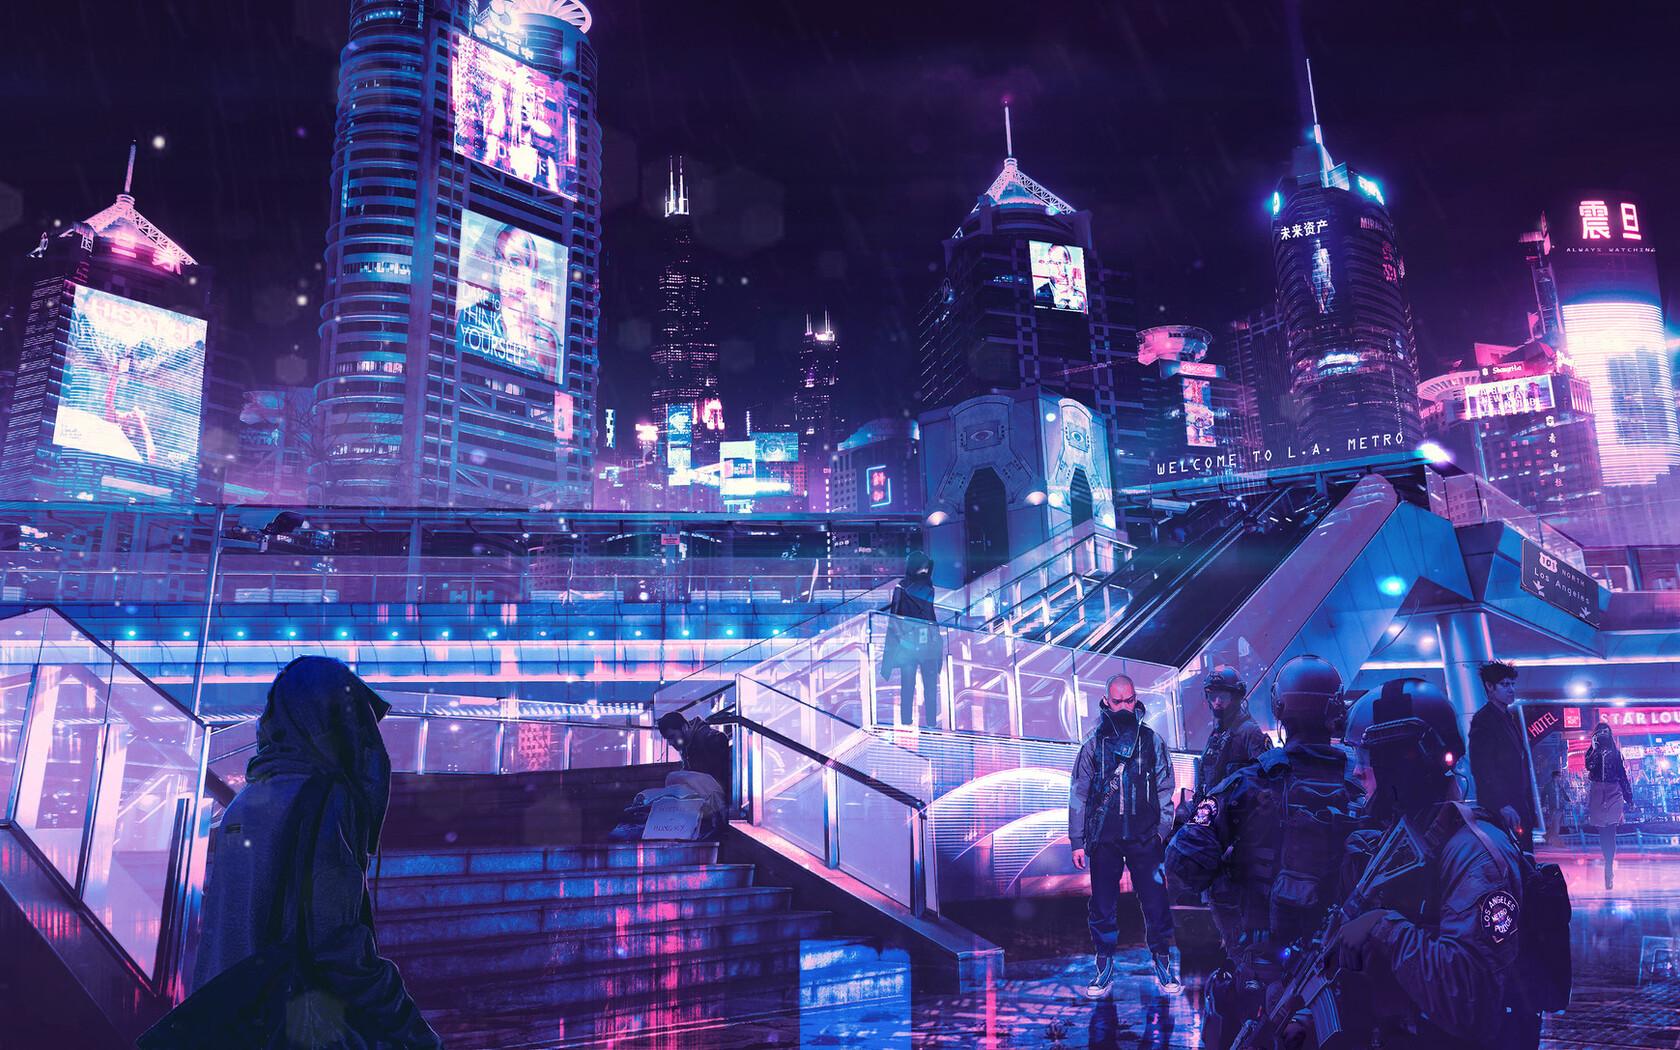 Cyberpunk 2077 City Wallpaper: 1680x1050 Cyberpunk Neon City 1680x1050 Resolution HD 4k